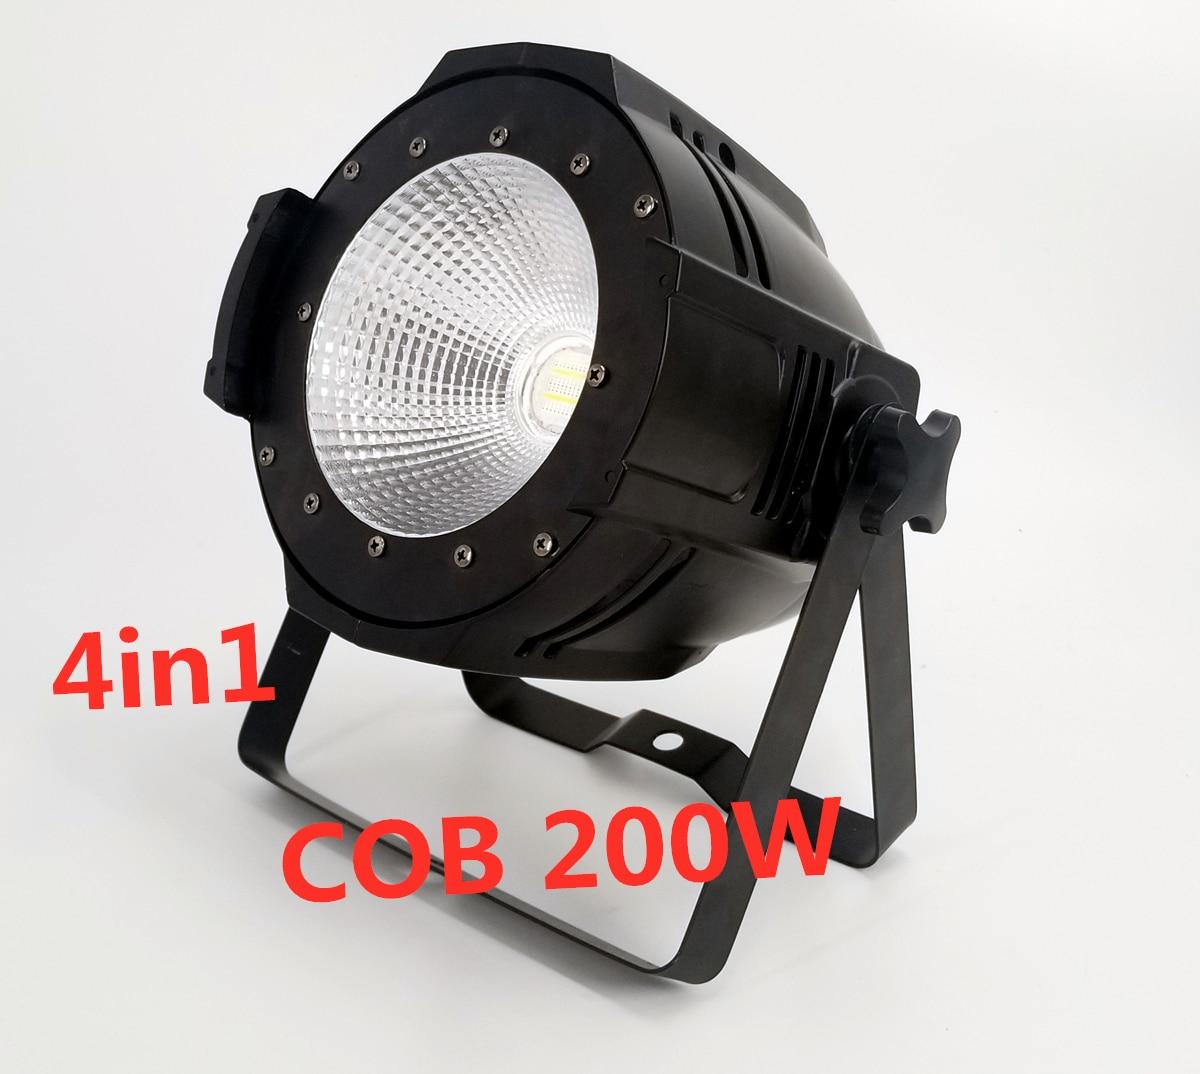 200W COB Led Par Light RGBW 4in1 dj light LED DMX disco Stage lighting effects